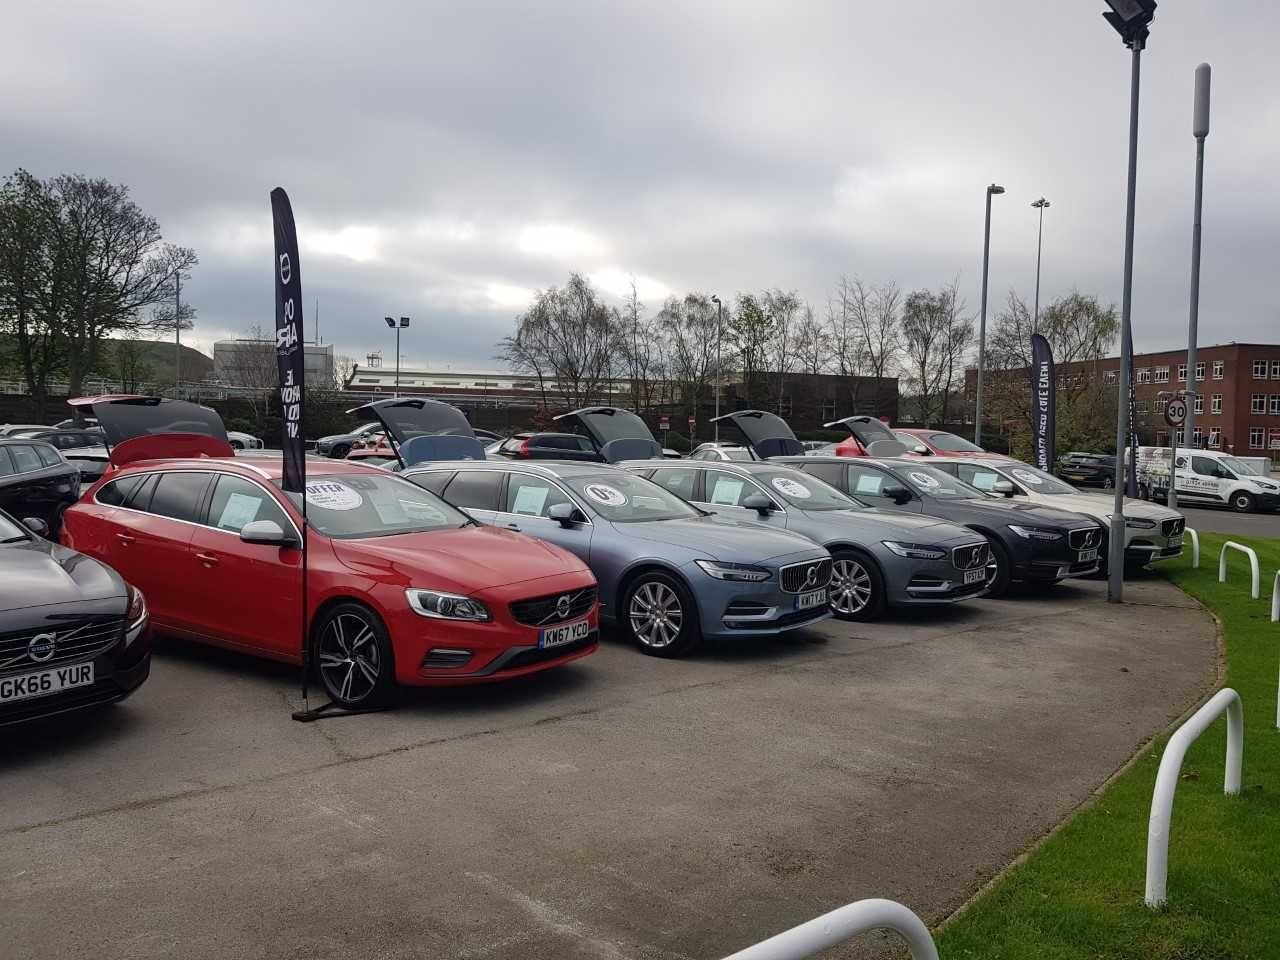 Approved Used Car Event at Huddersfield CliveBrookVolvo